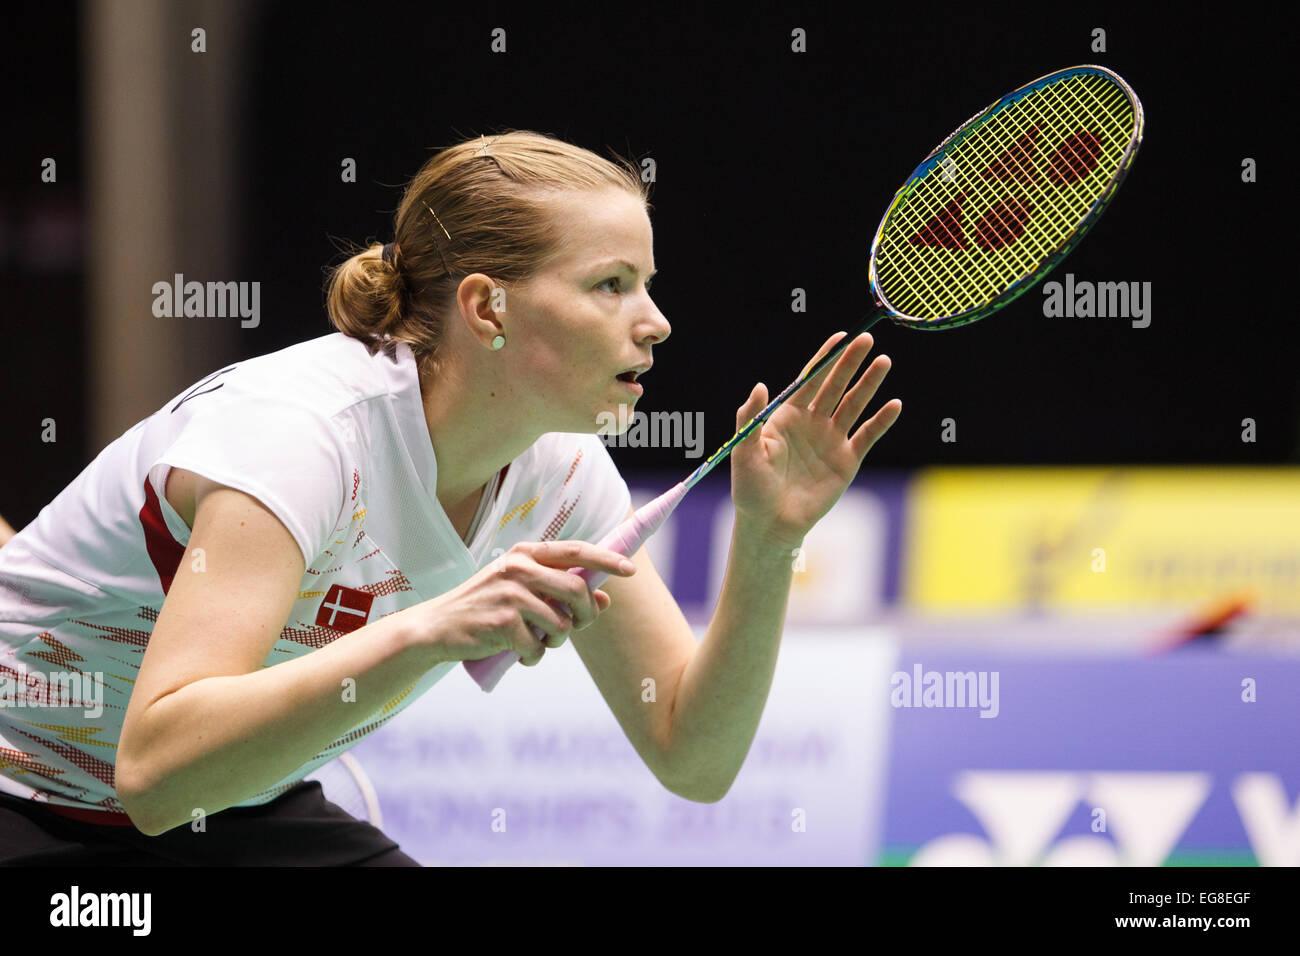 LEUVEN BELGIUM 13 02 2015 Badminton players Christinna Pedersen